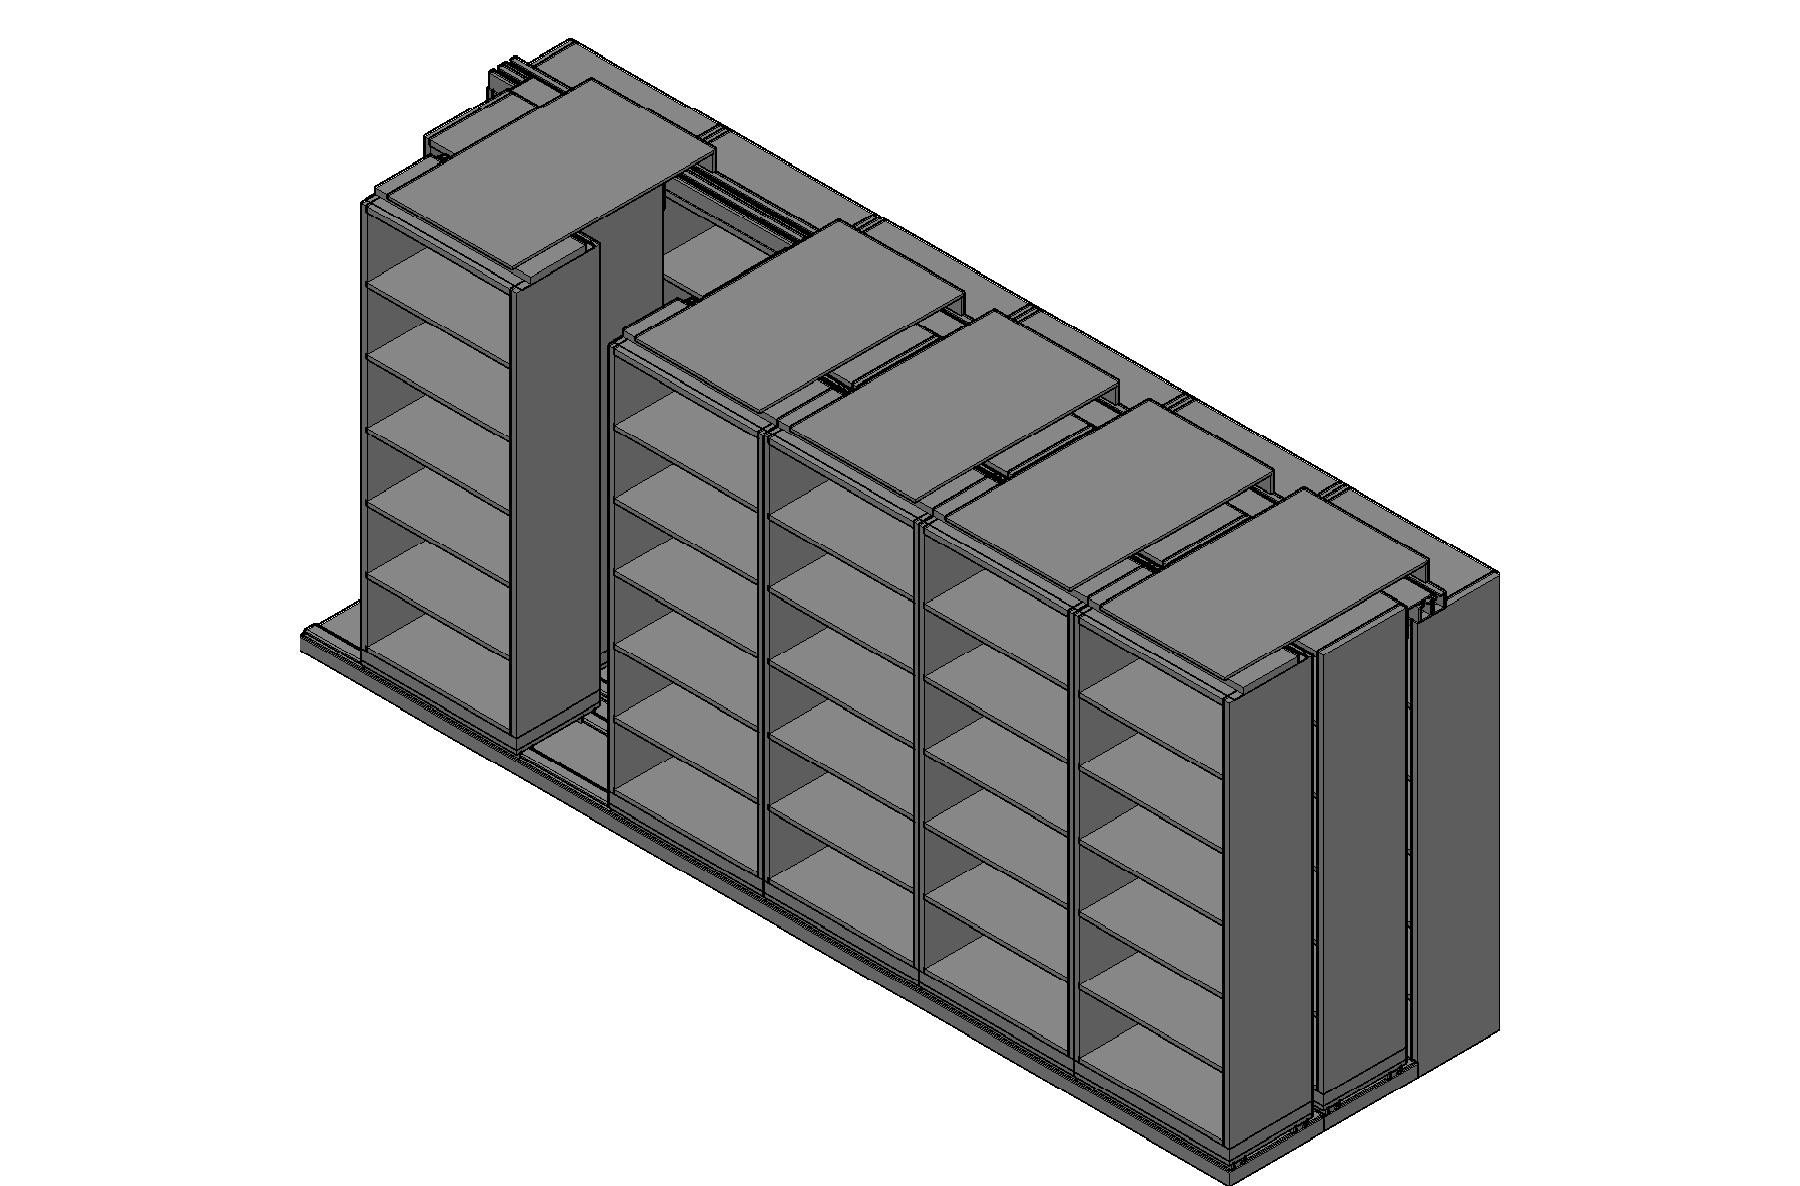 "Box Size Sliding Shelves - 3 Rows Deep - 6 Levels - (30"" x 16"" Shelves) - 184"" Total Width"